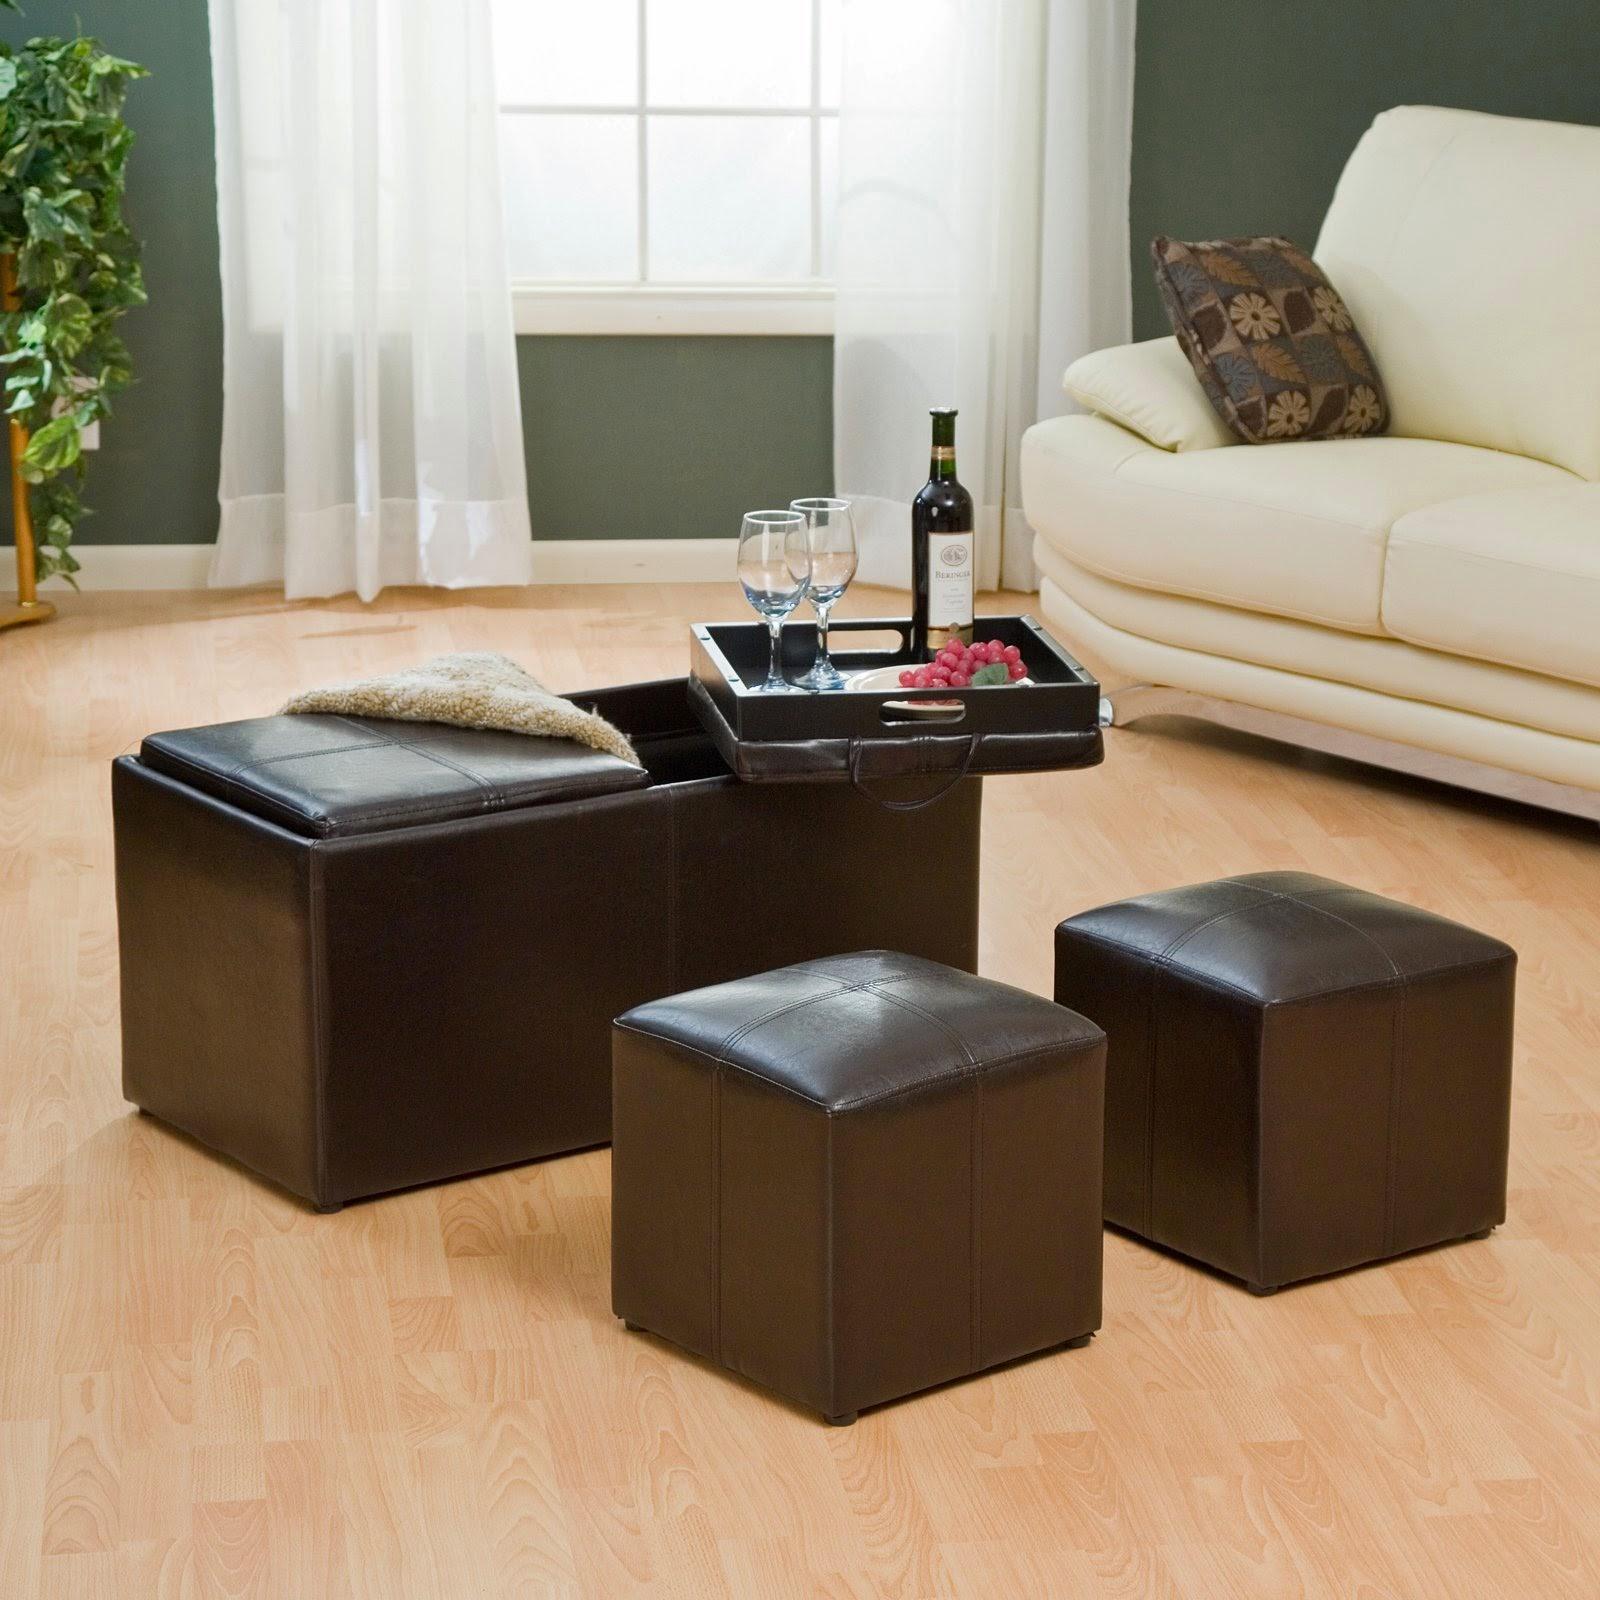 sofa đa năng